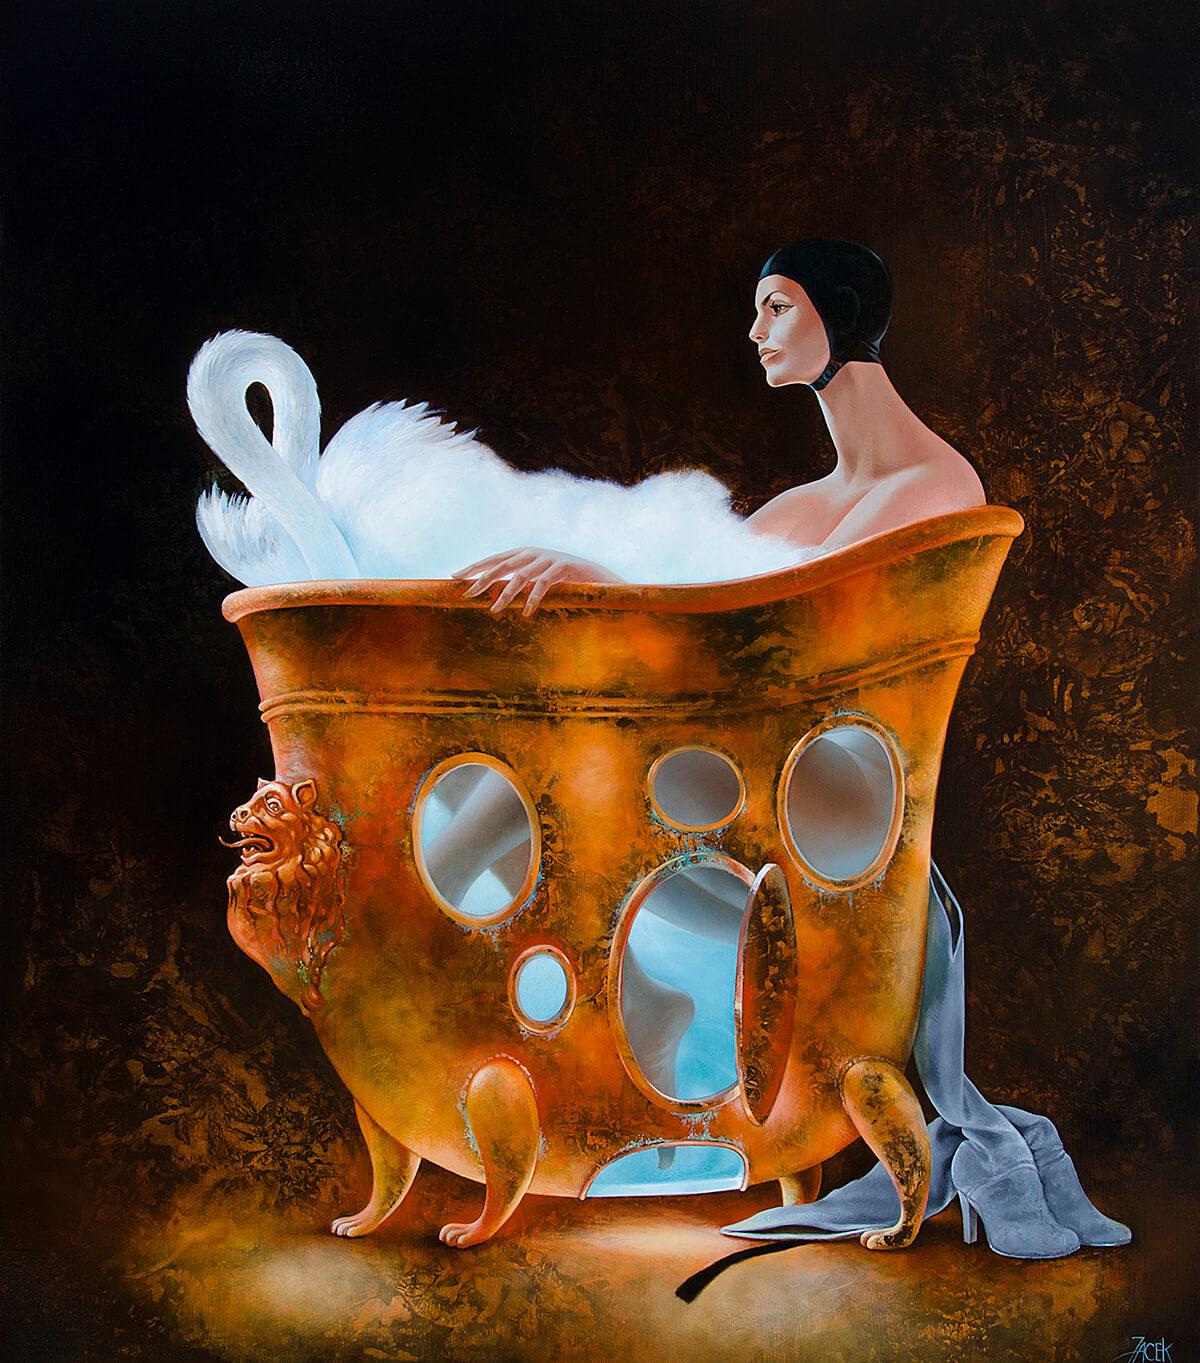 oil on canvas, 100 x 85 cm, 2012